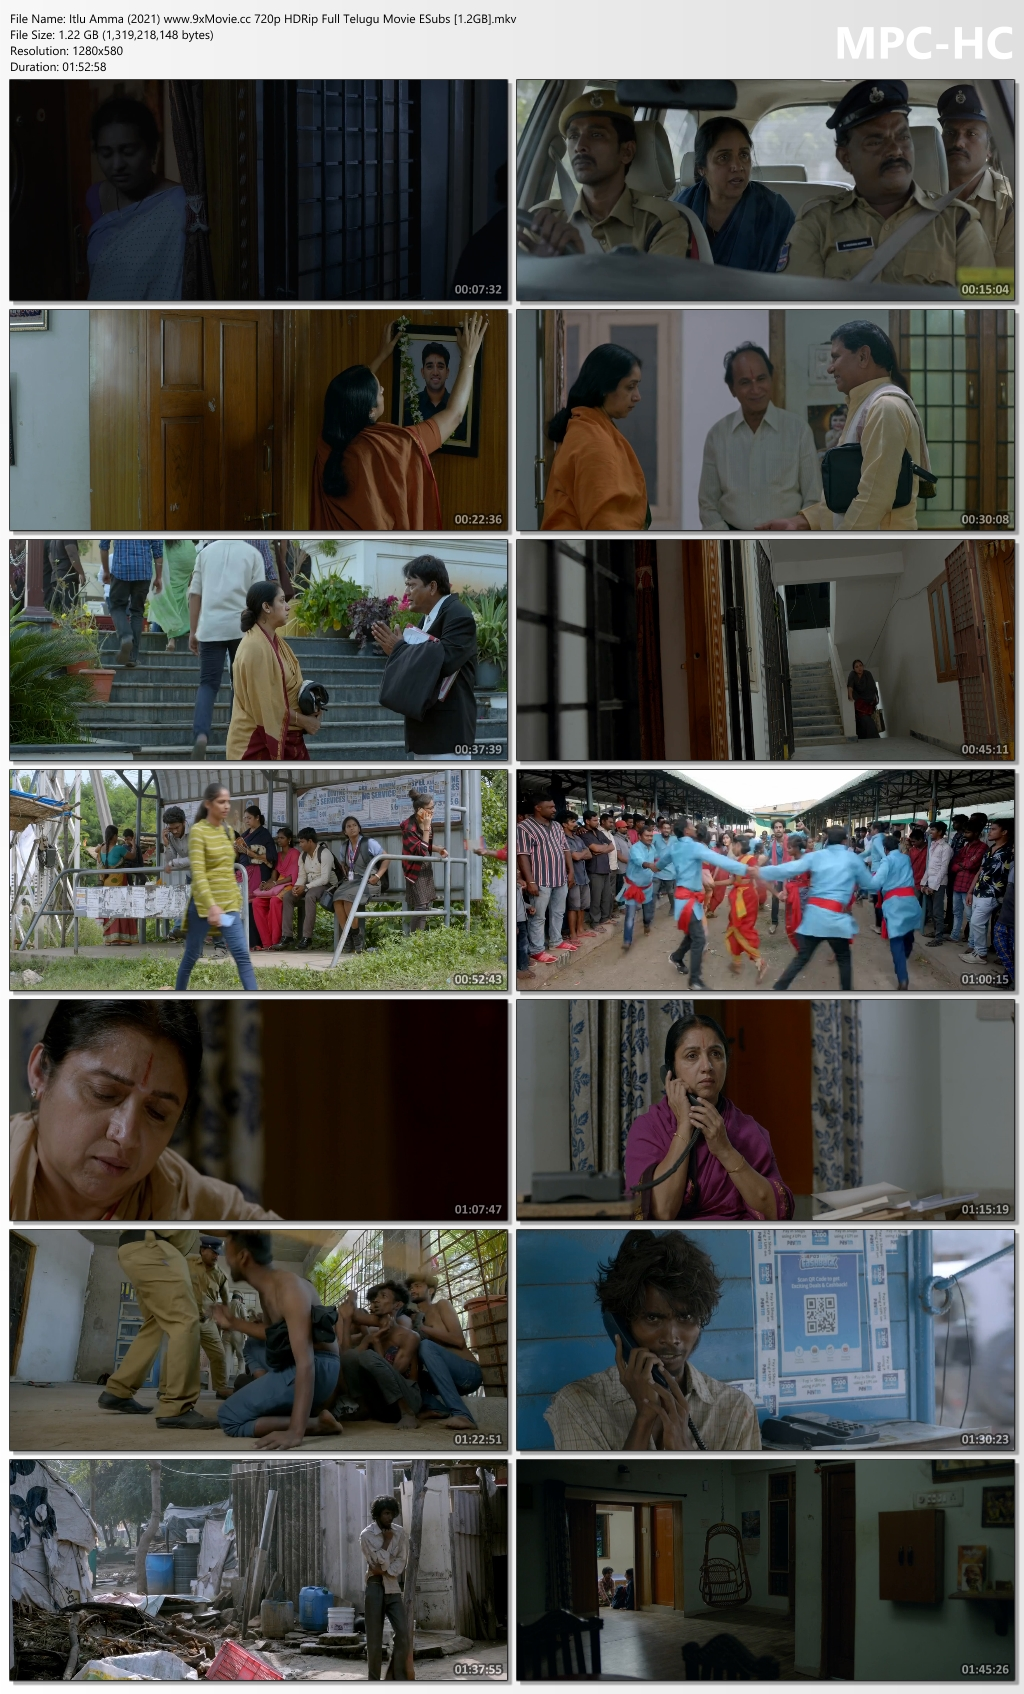 Itlu-Amma-2021-www-9x-Movie-cc-720p-HDRip-Full-Telugu-Movie-ESubs-1-2-GB-mkv